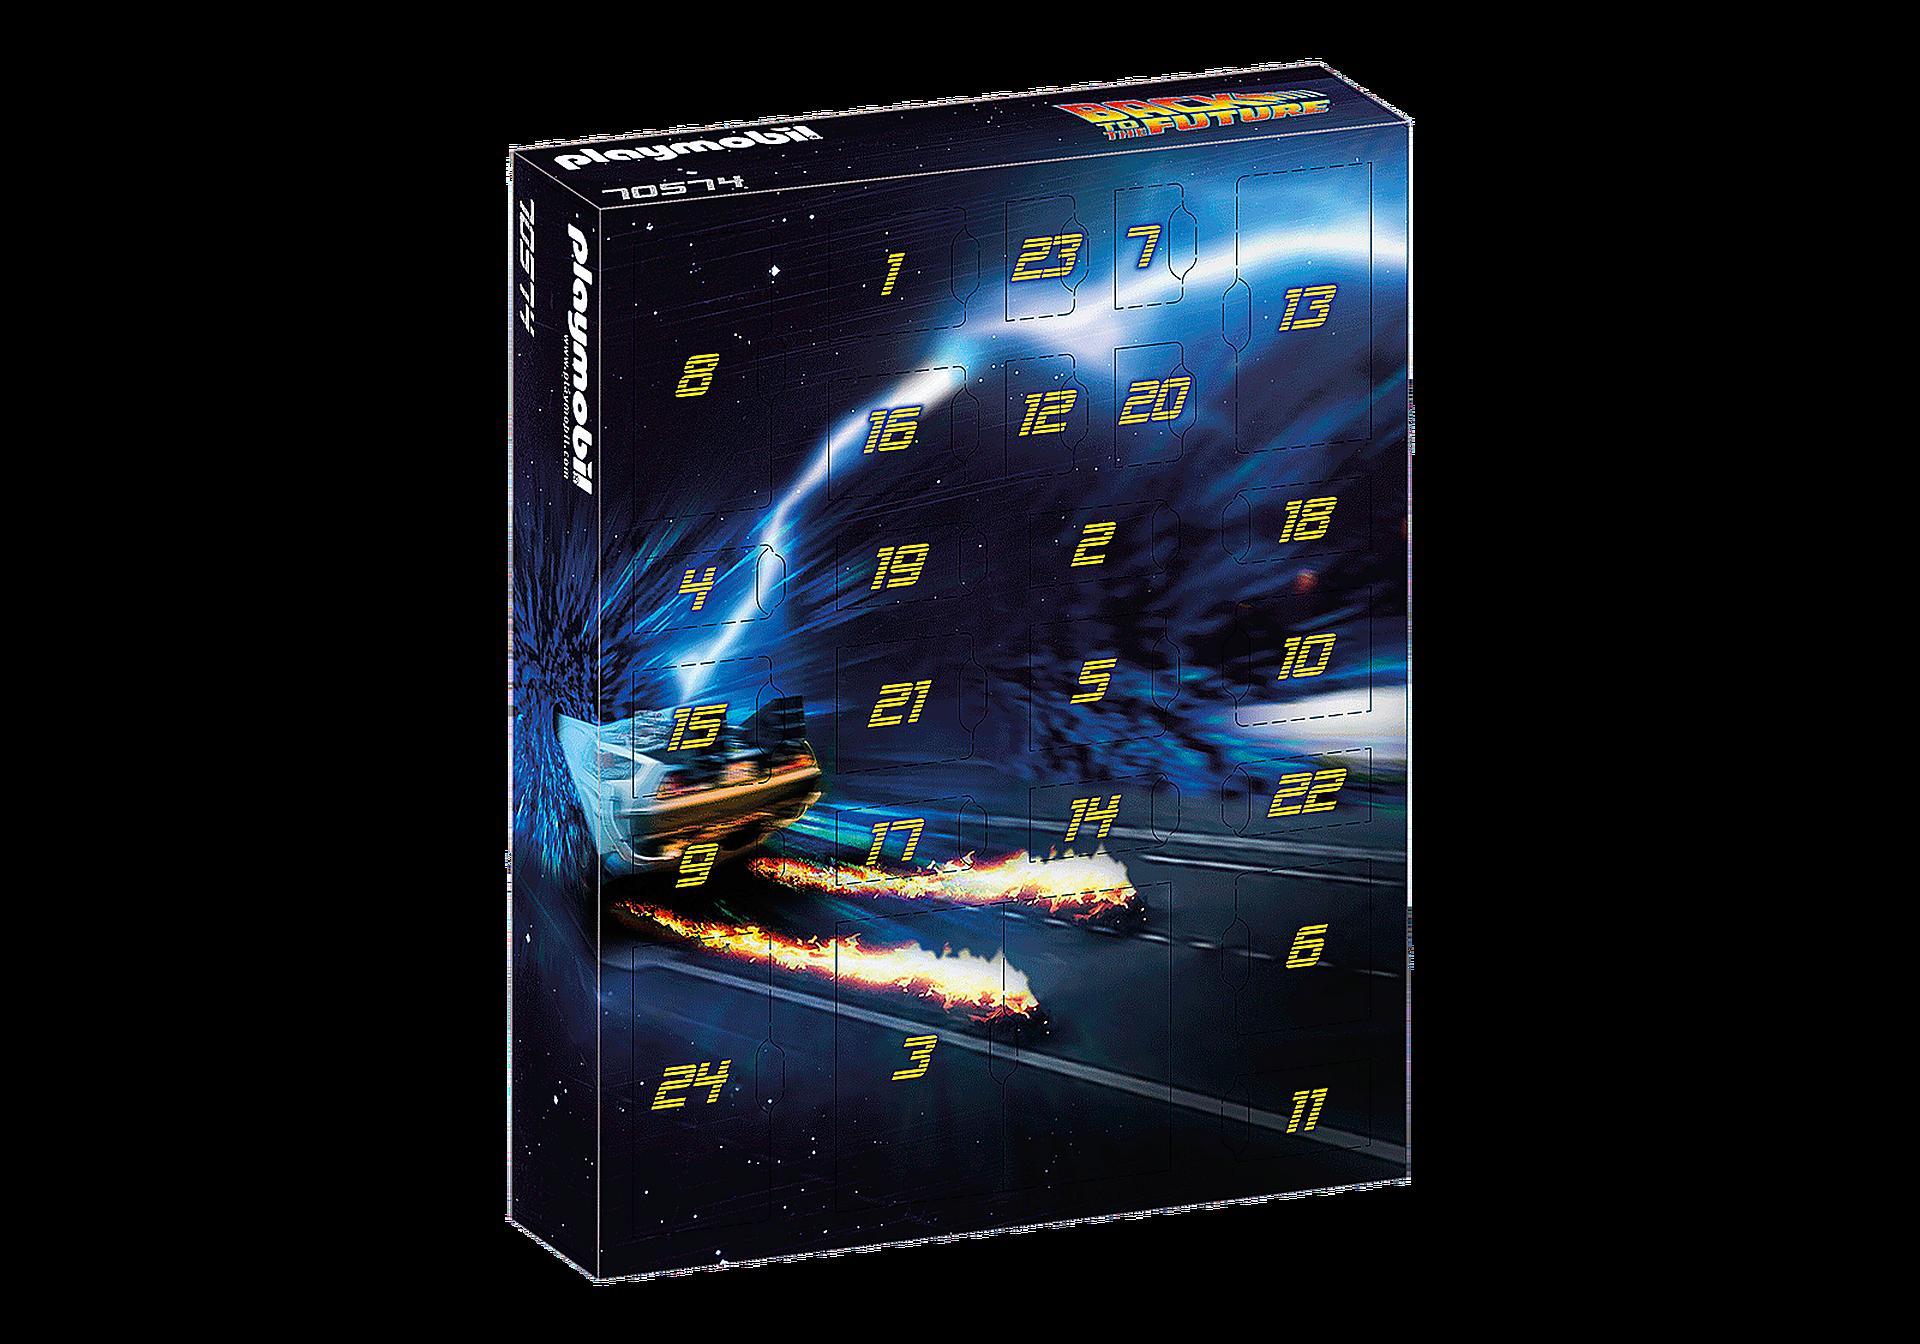 70574 Calendrier de l'Avent 'Back to the Future' zoom image4